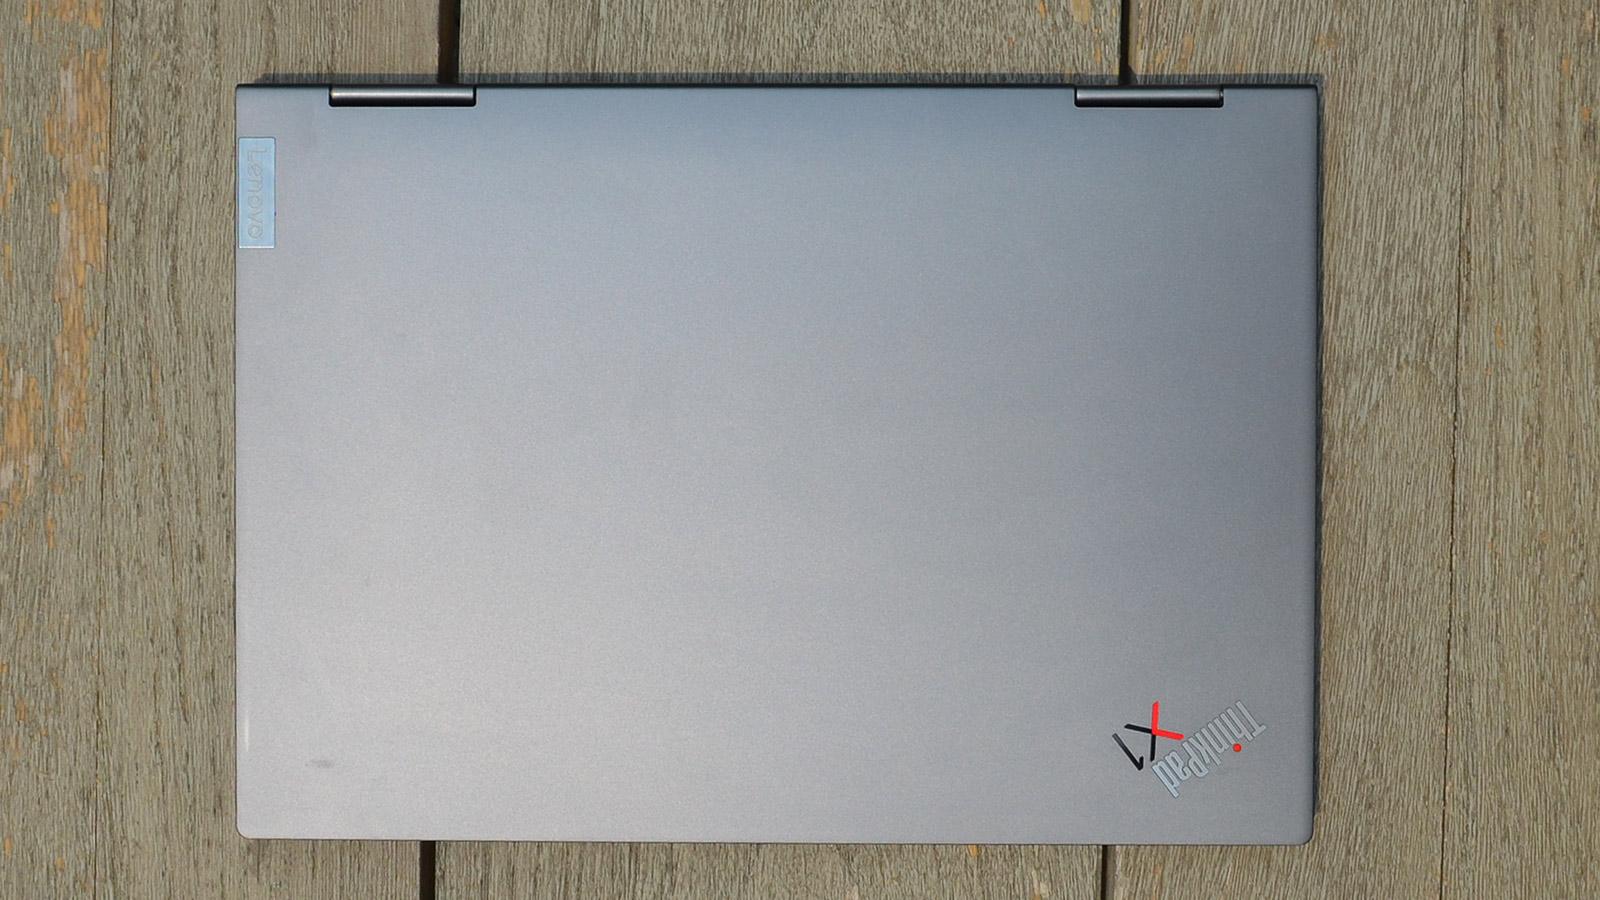 Lenovo ThinkPad X1 Yoga Gen 6 Top Down View Of Lid